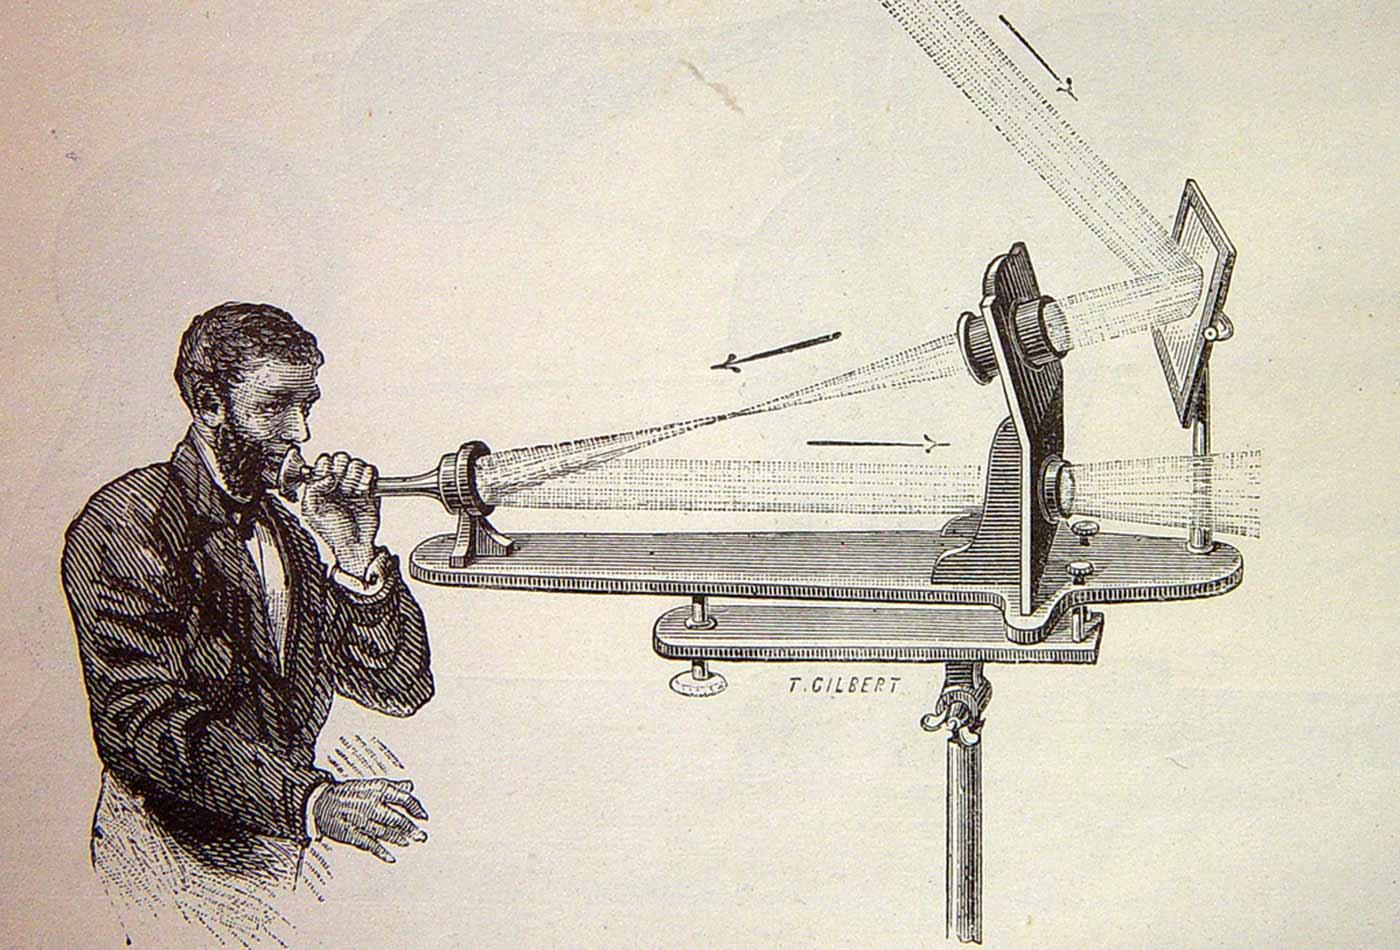 Illustration of the photophone's transmitter.